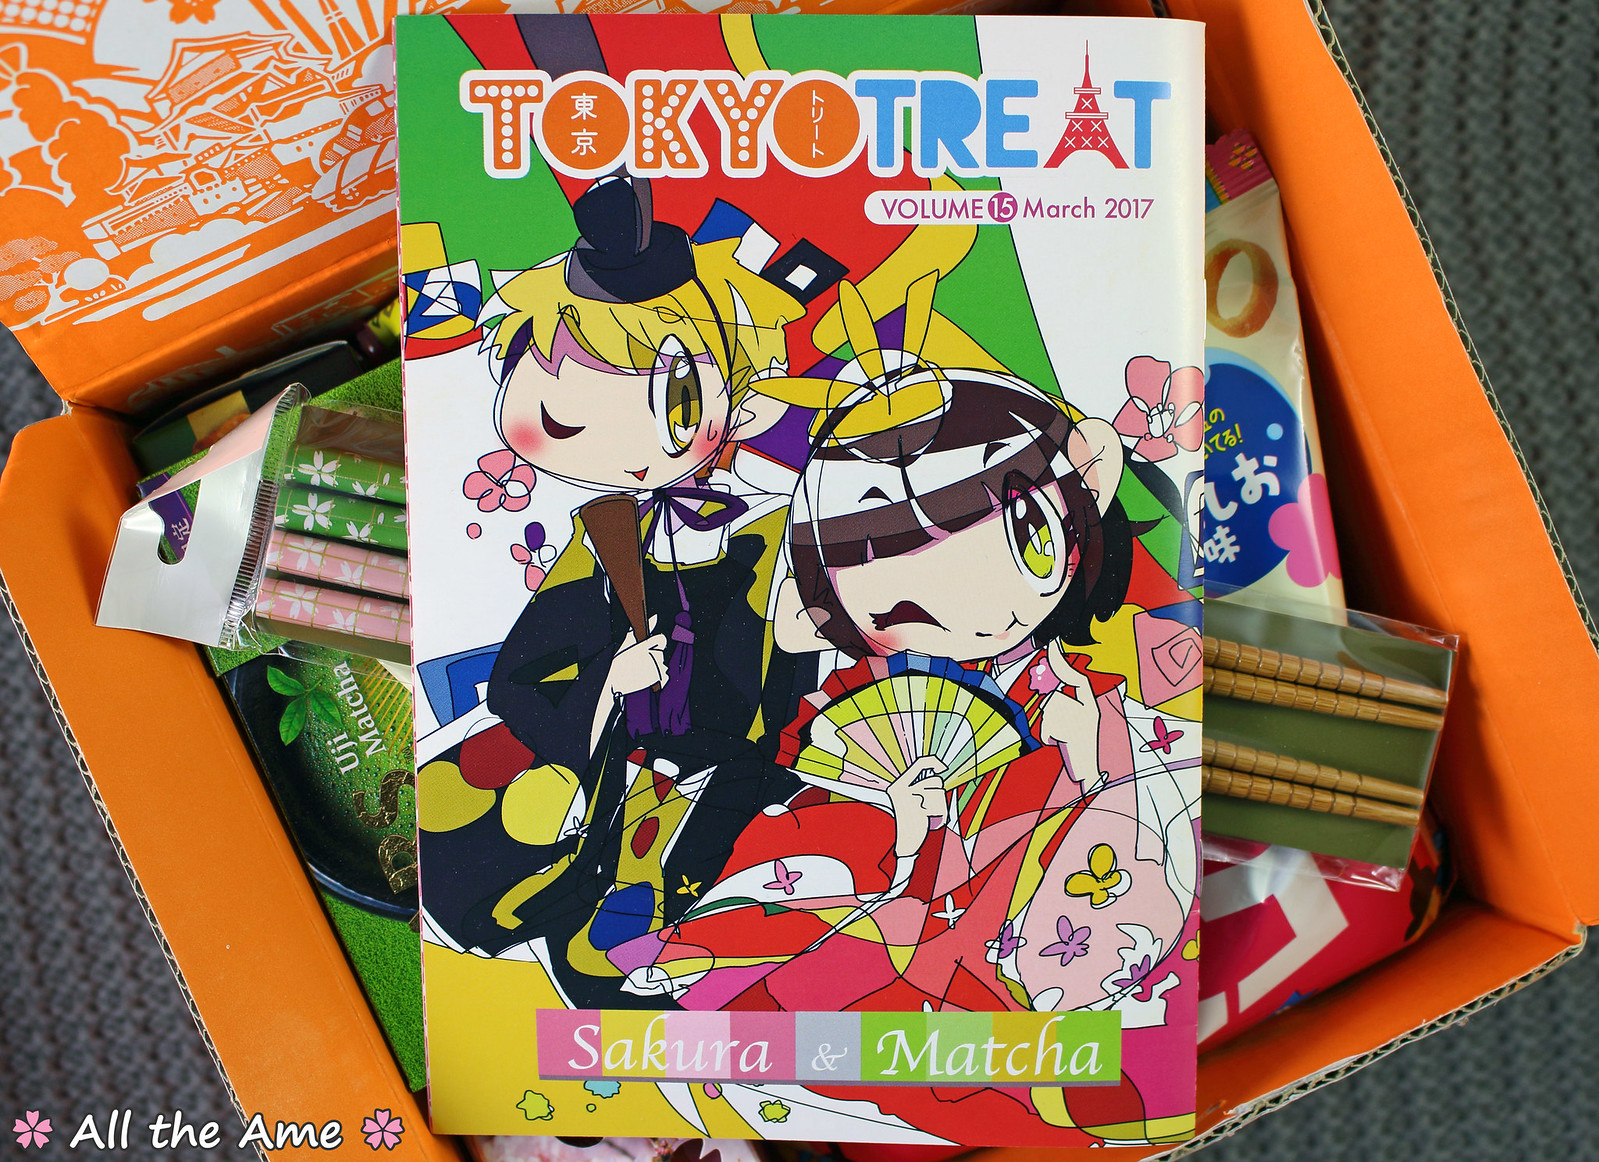 TokyoTreat Sakura & Matcha